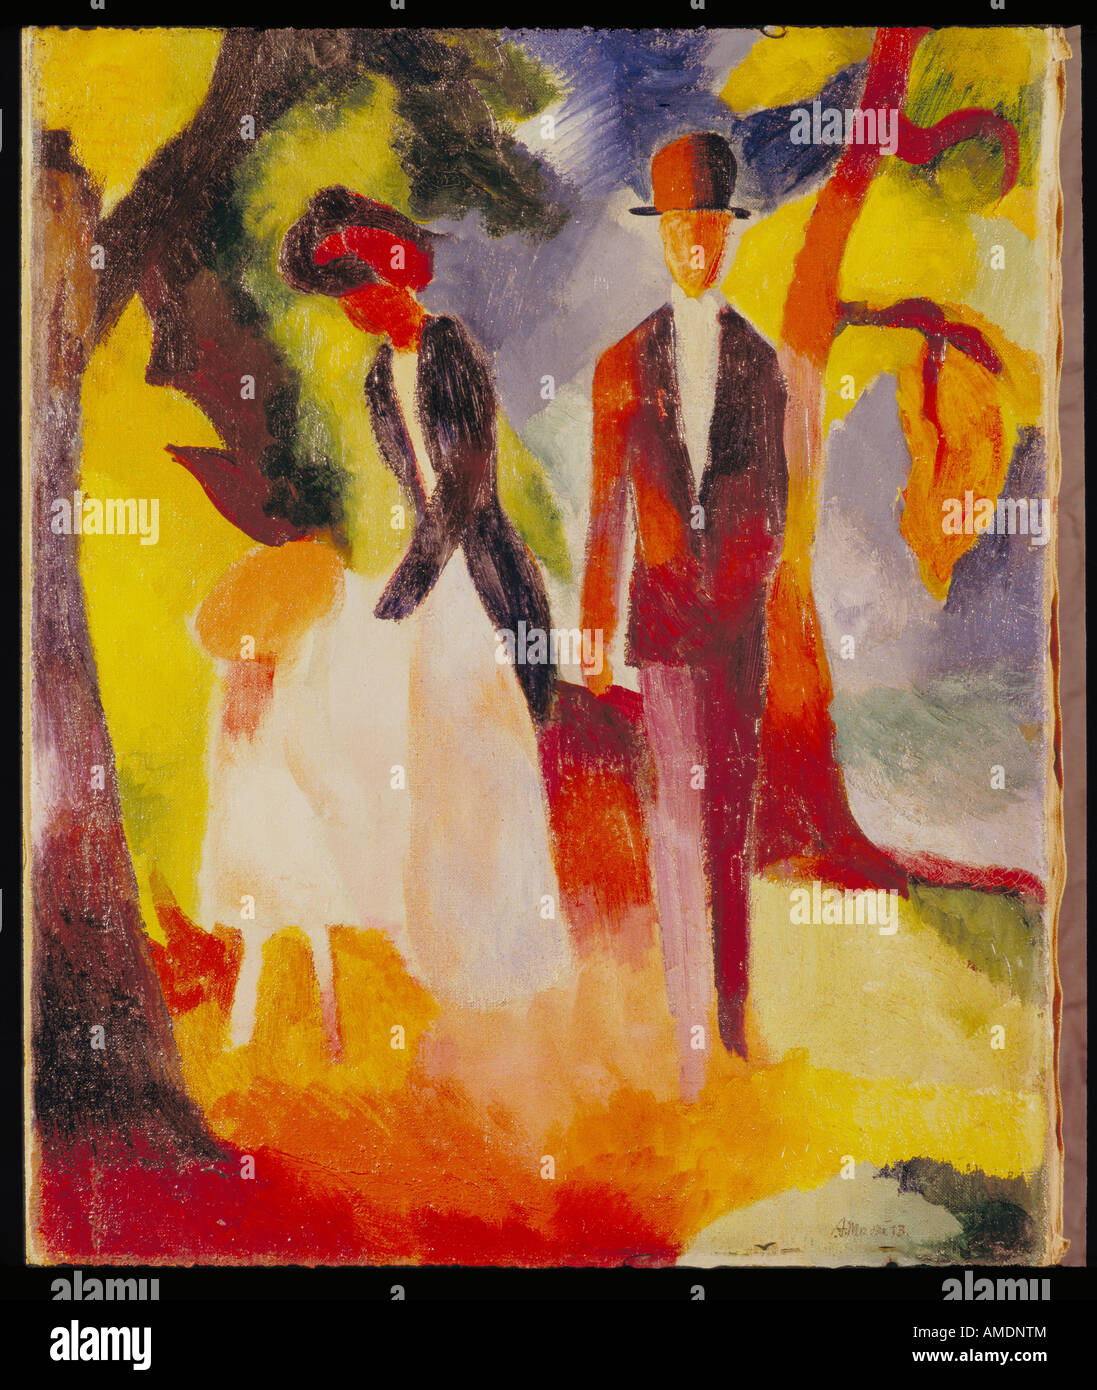 'Fine Arts, Macke, August, (3.1.1887 - 26.9.1914), peinture, 'Leute am blauen See', 'Les Gens au Photo Stock